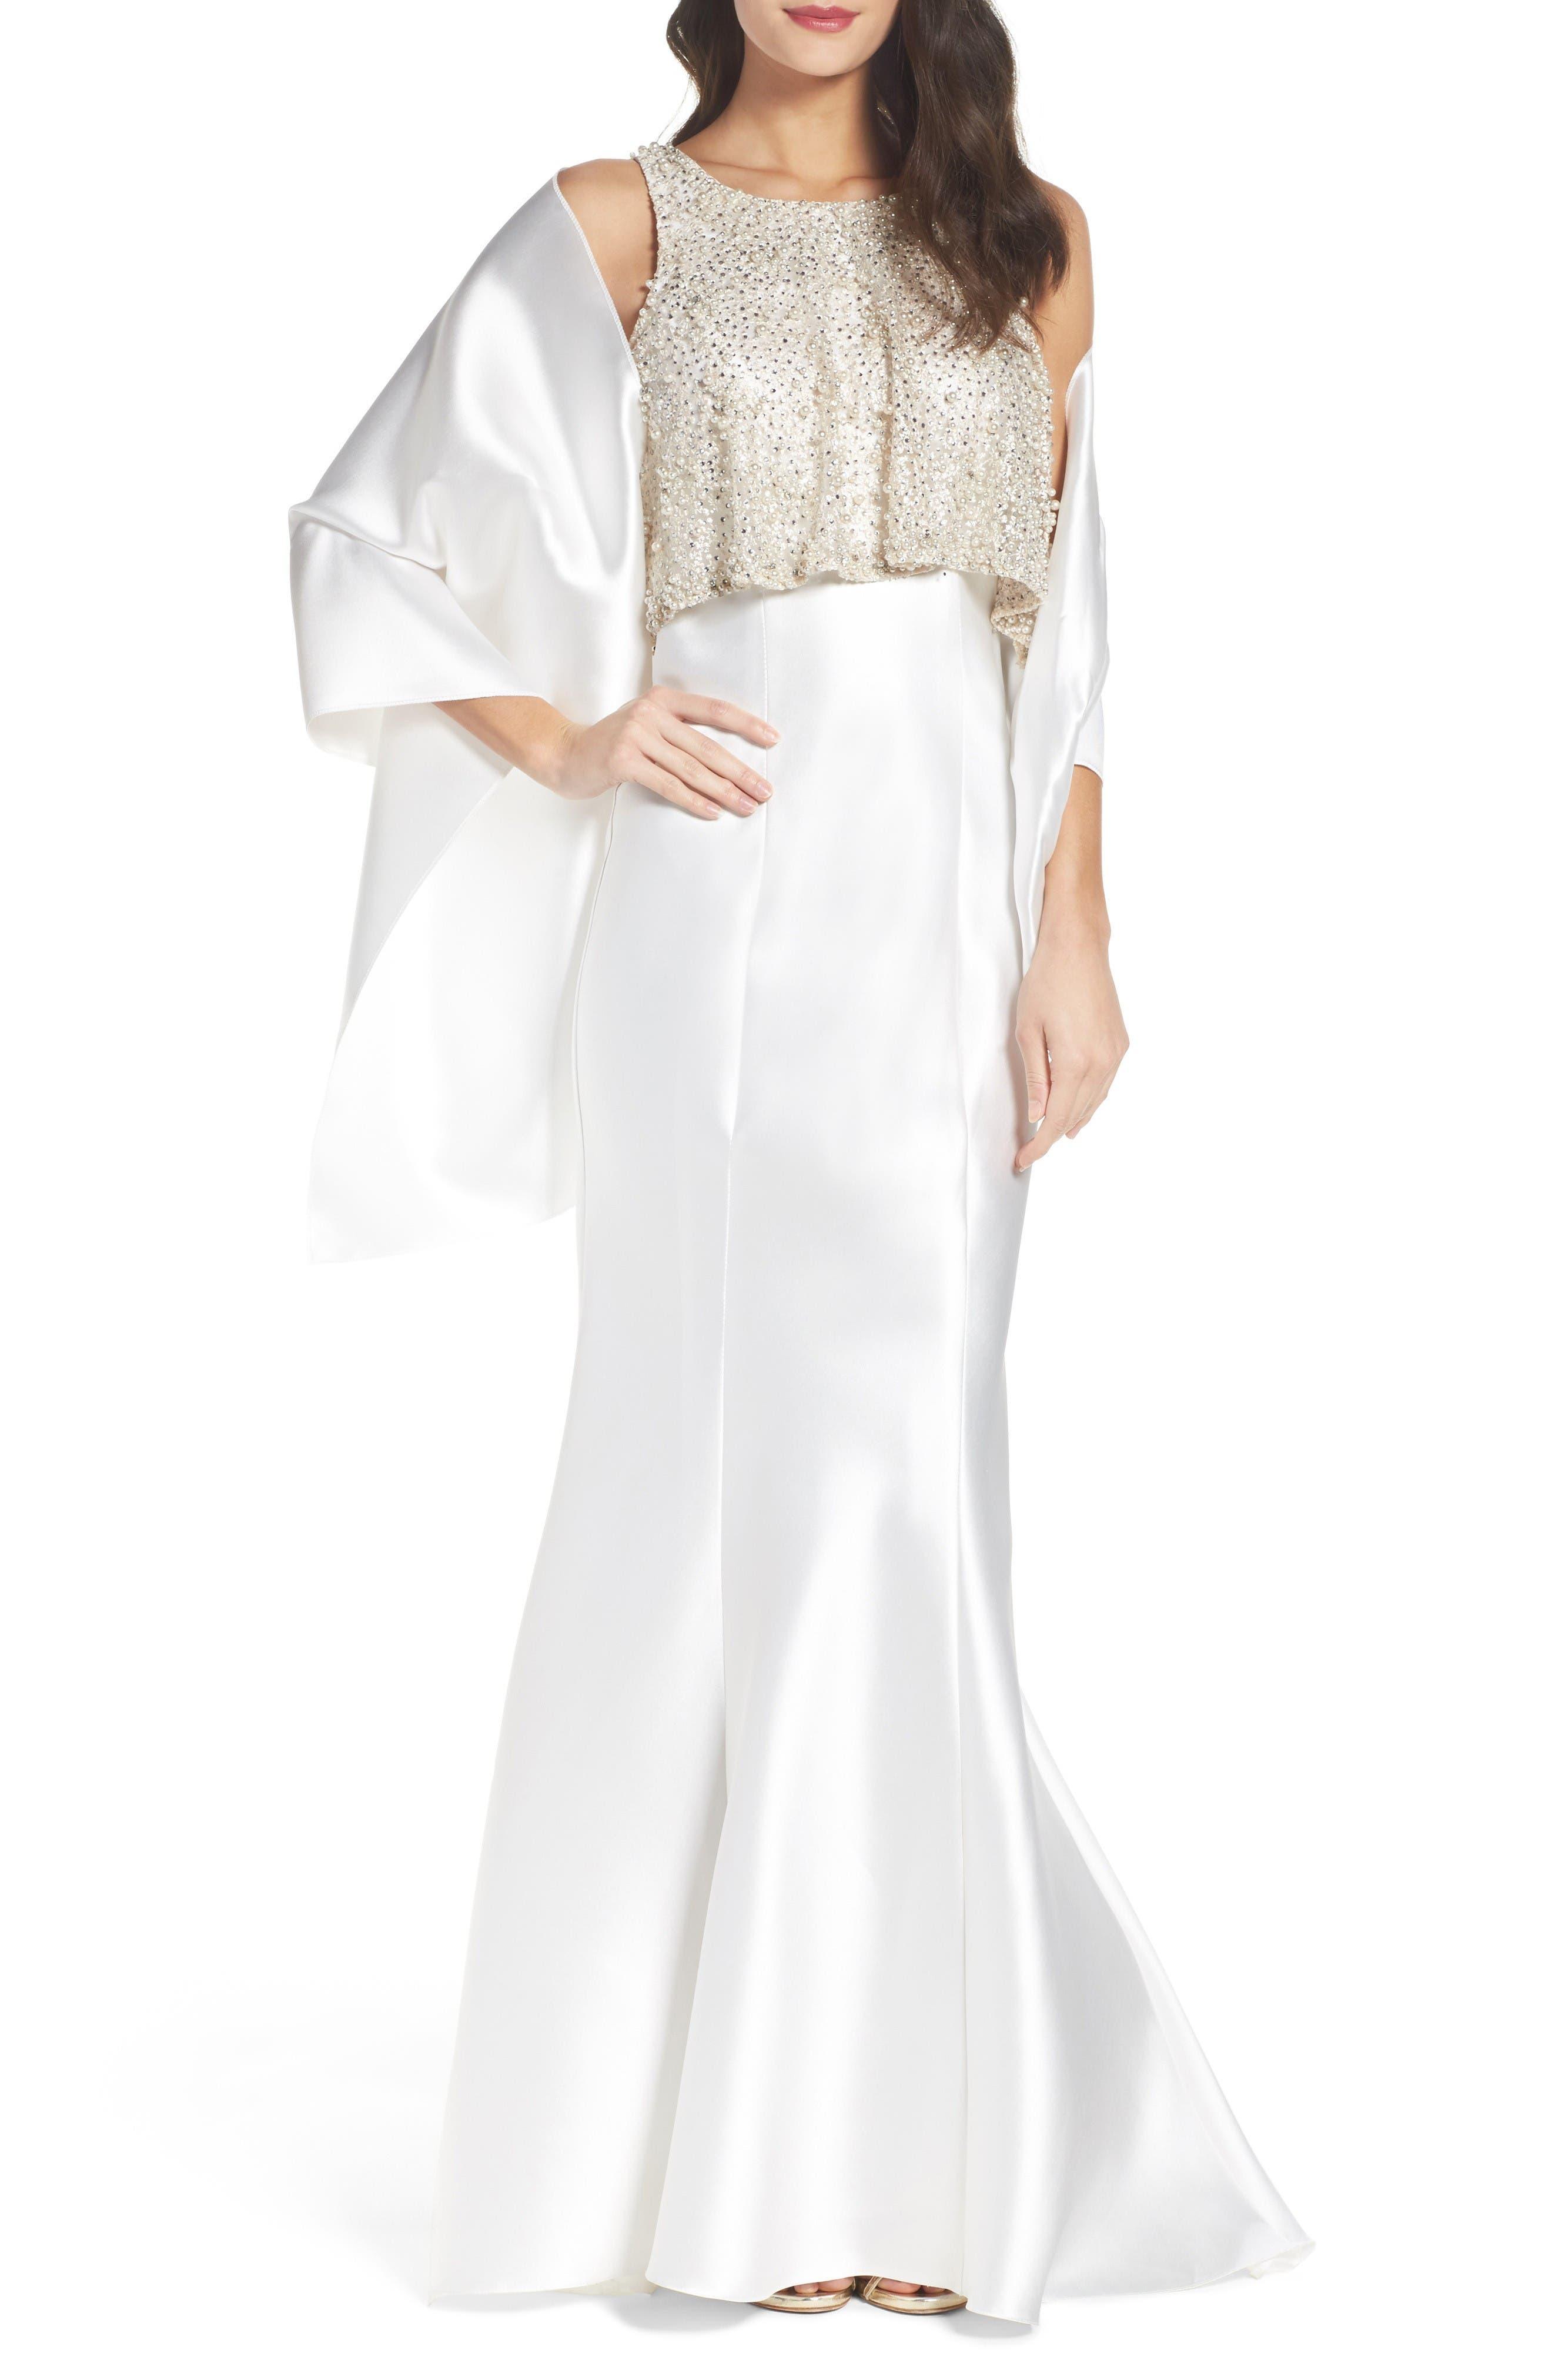 Main Image - Mac Duggal Embellished Trumpet Gown & Shawl